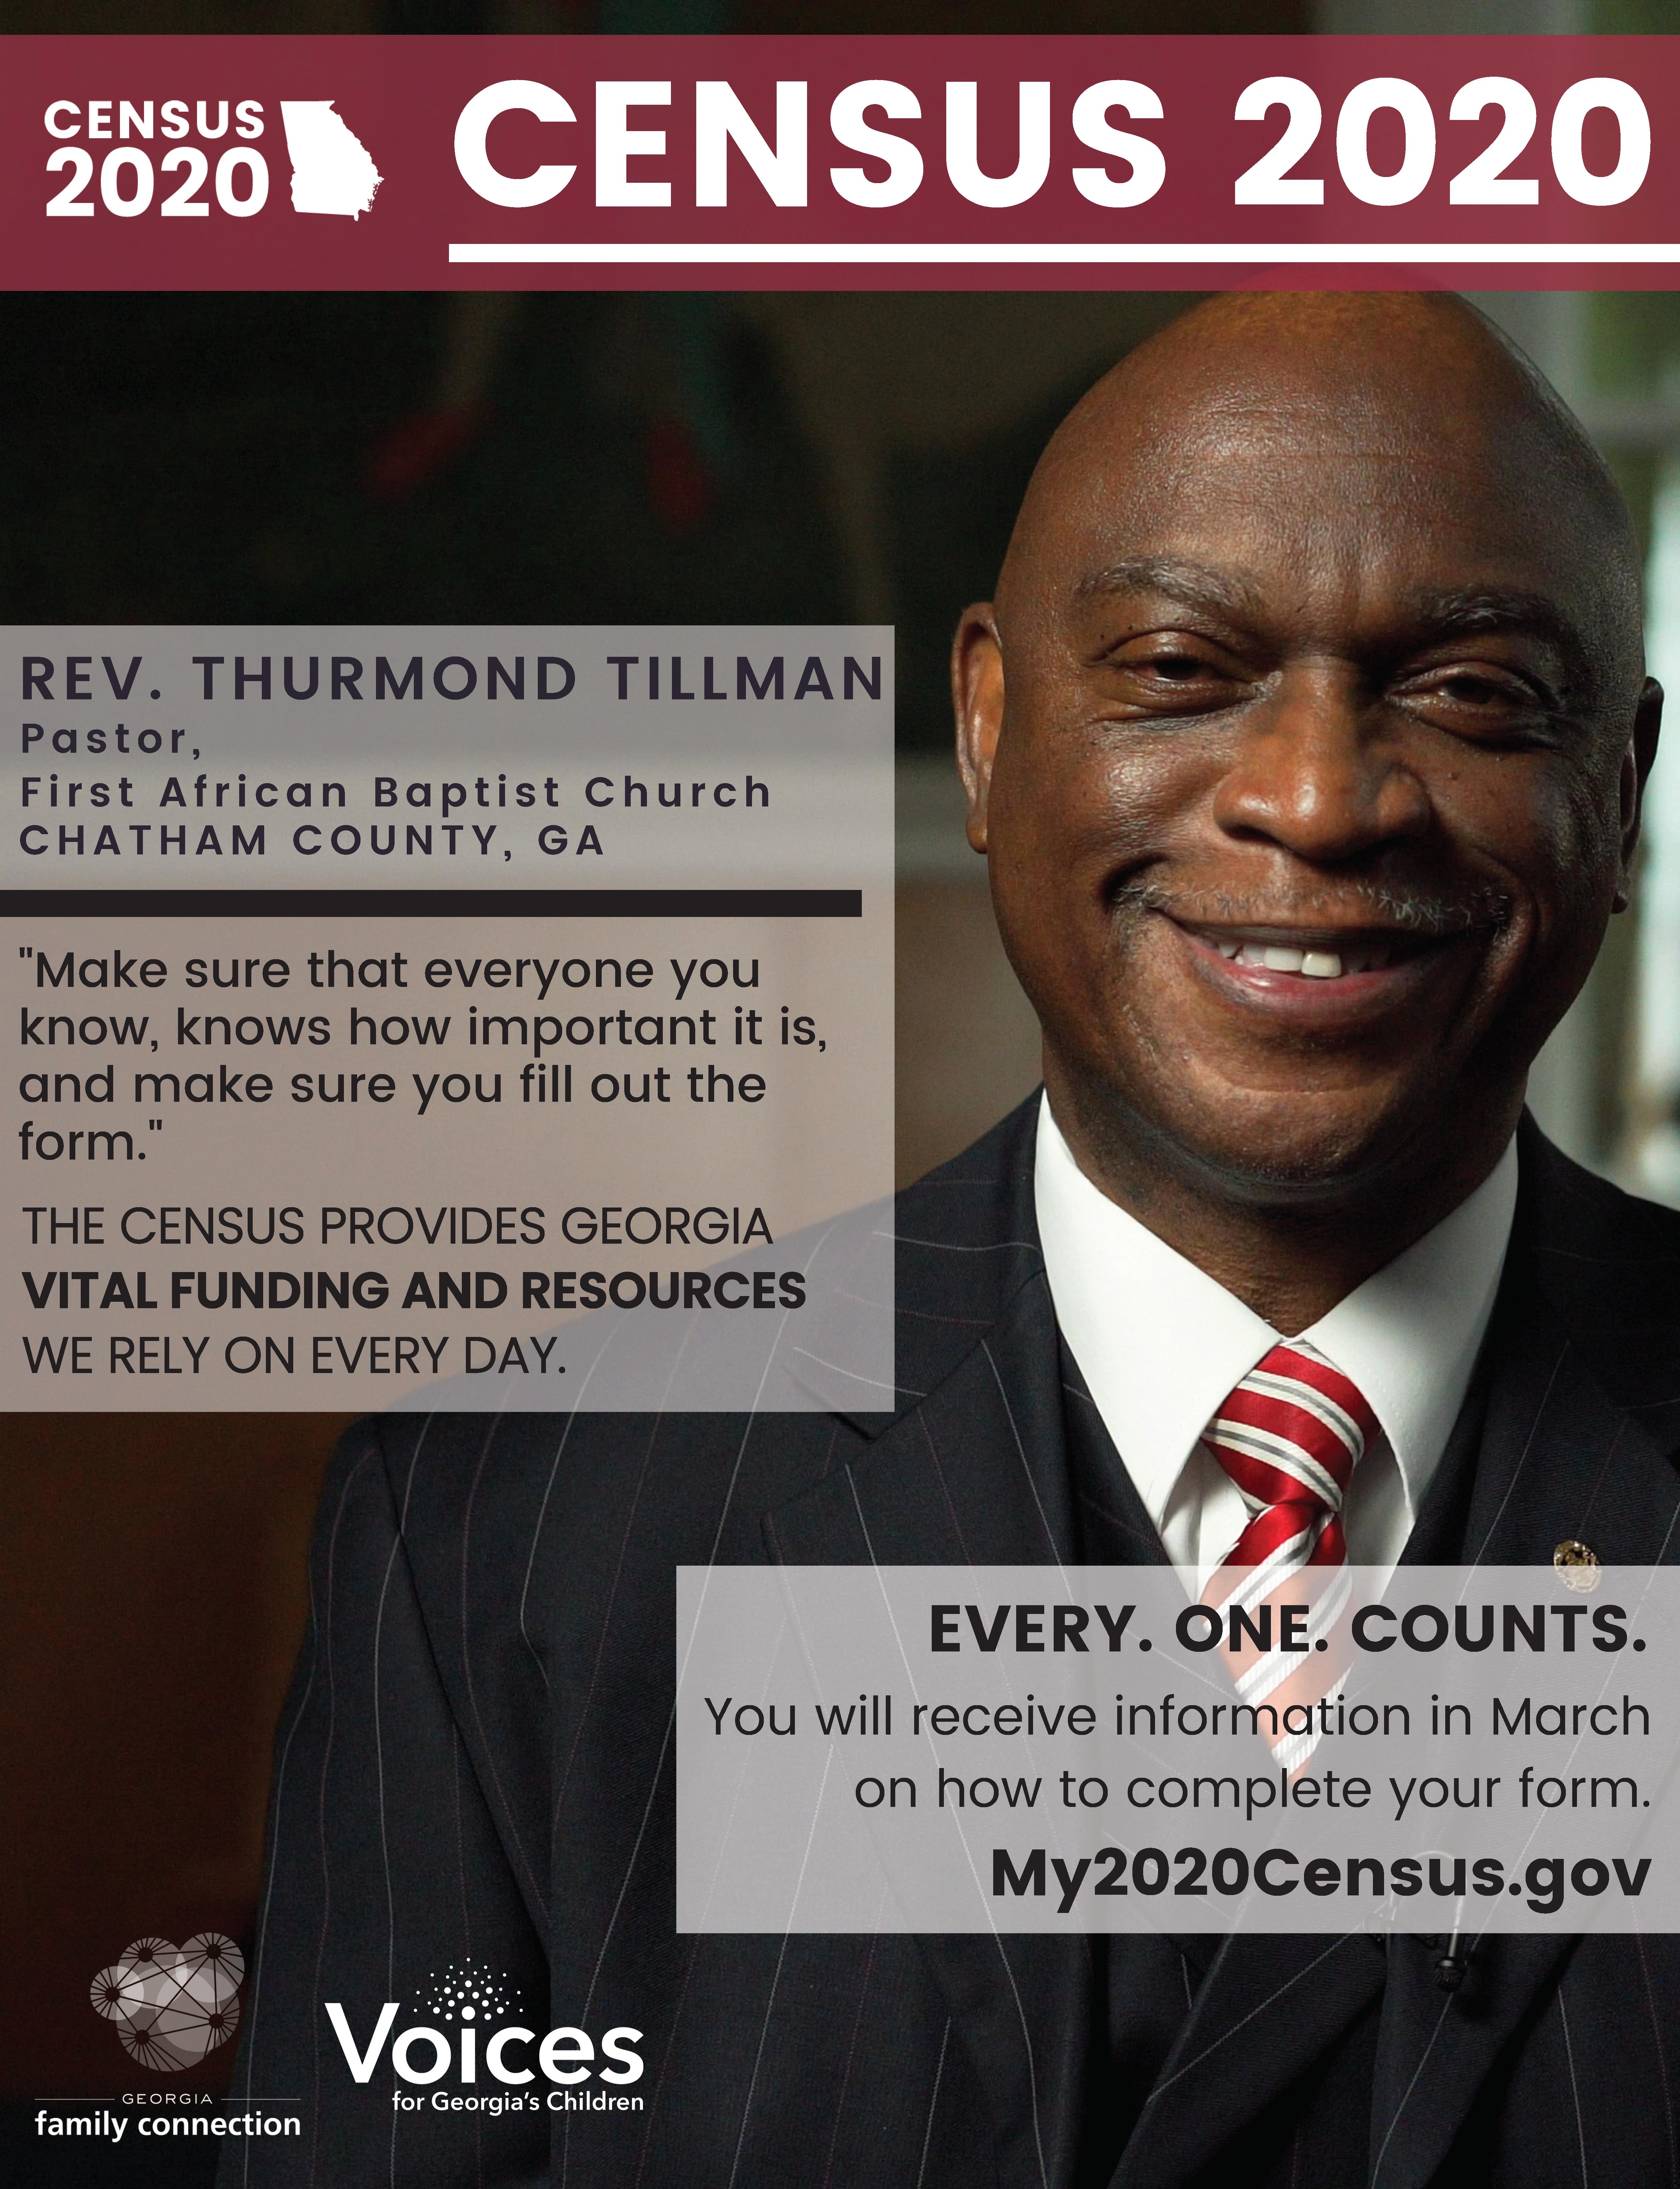 Reverend Thurmond Tillman Poster